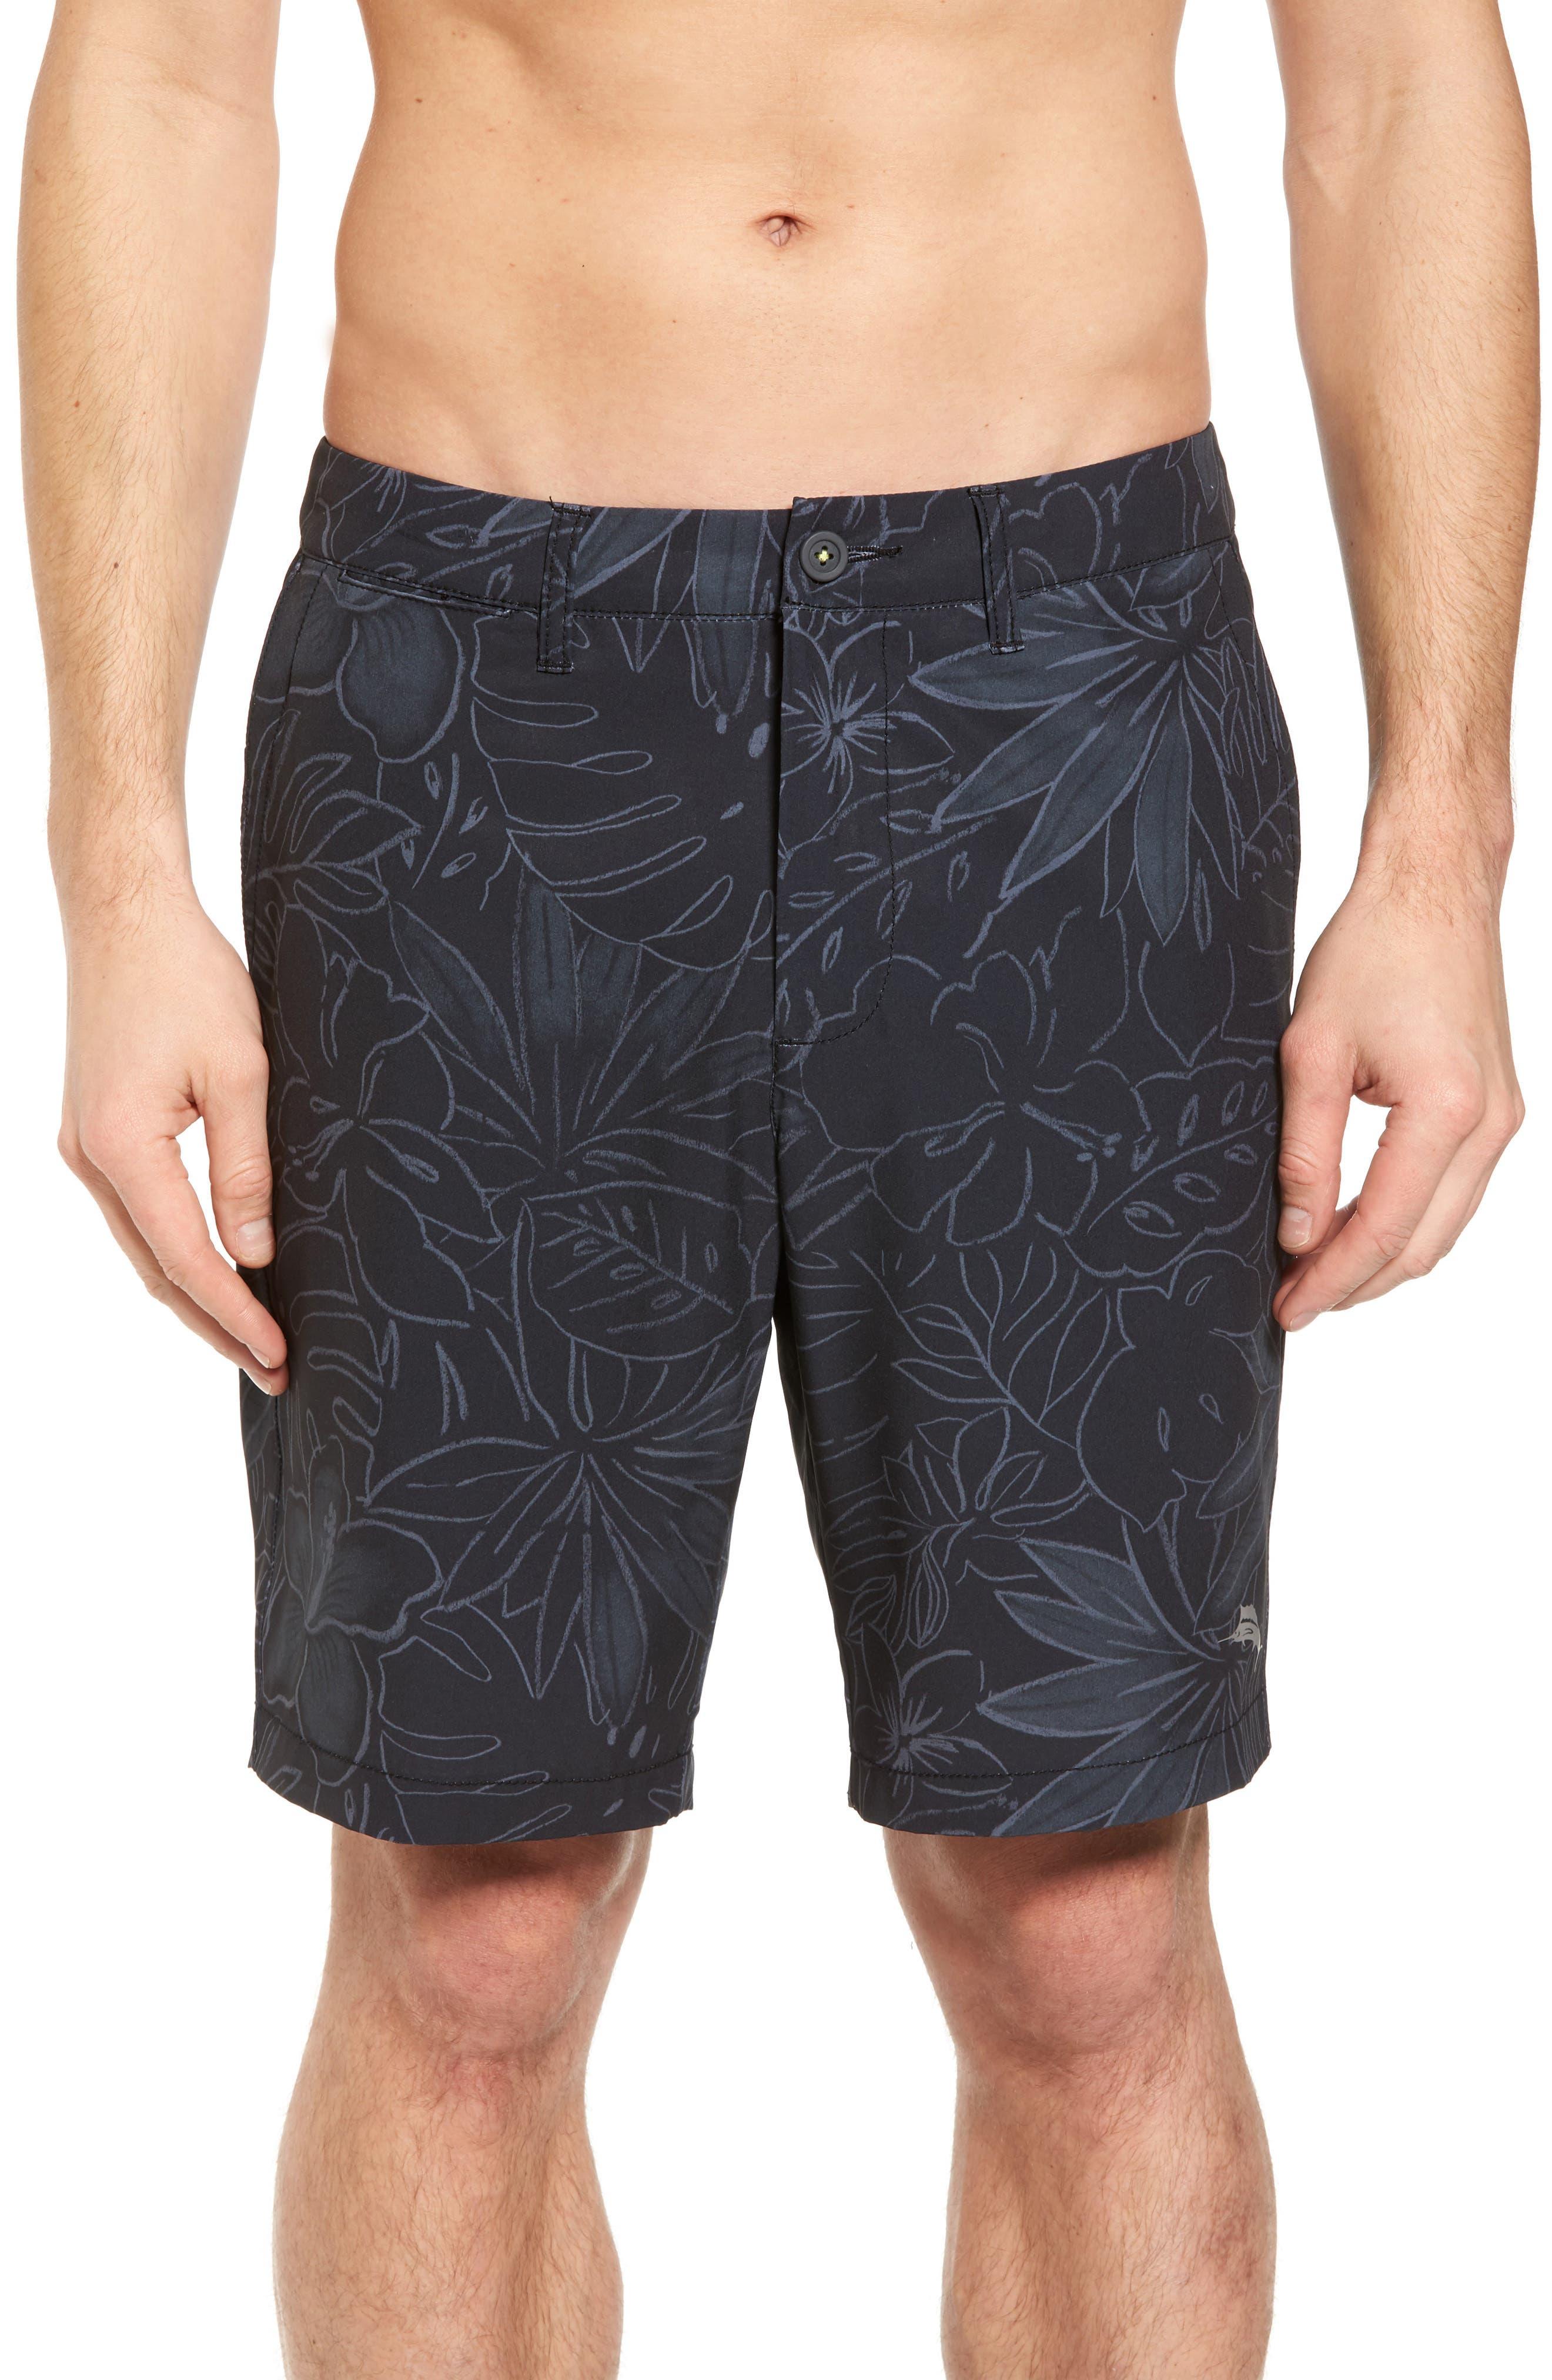 Cayman Sarasota Sketch Swim Trunks,                         Main,                         color, Black